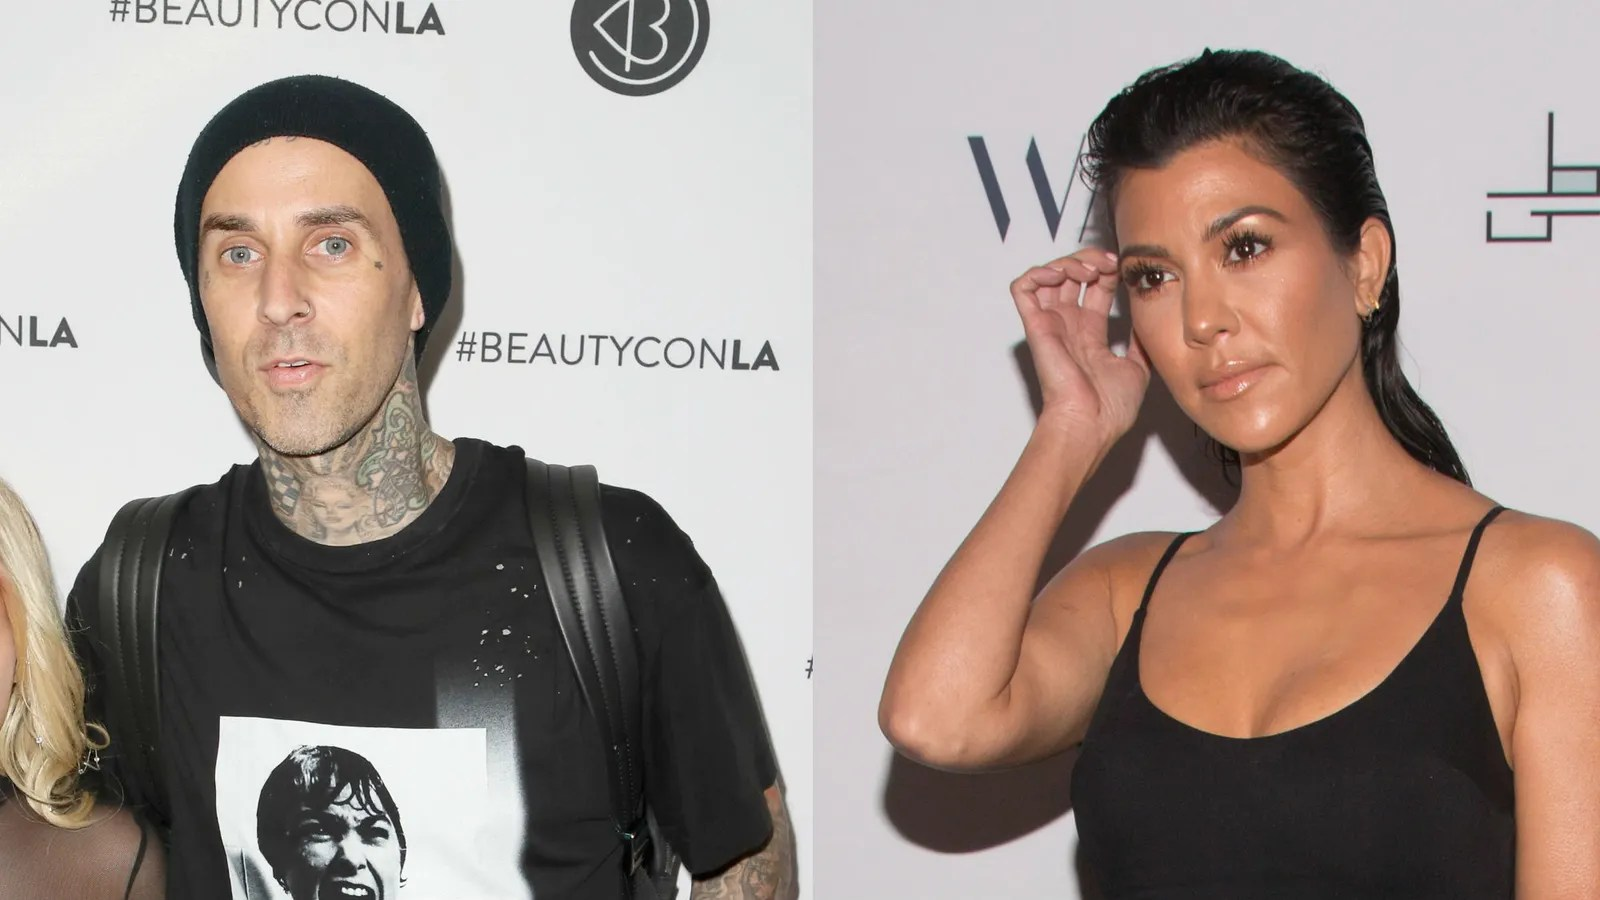 Kourtney Kardashian and Travis Barker Spotted Hanging Out